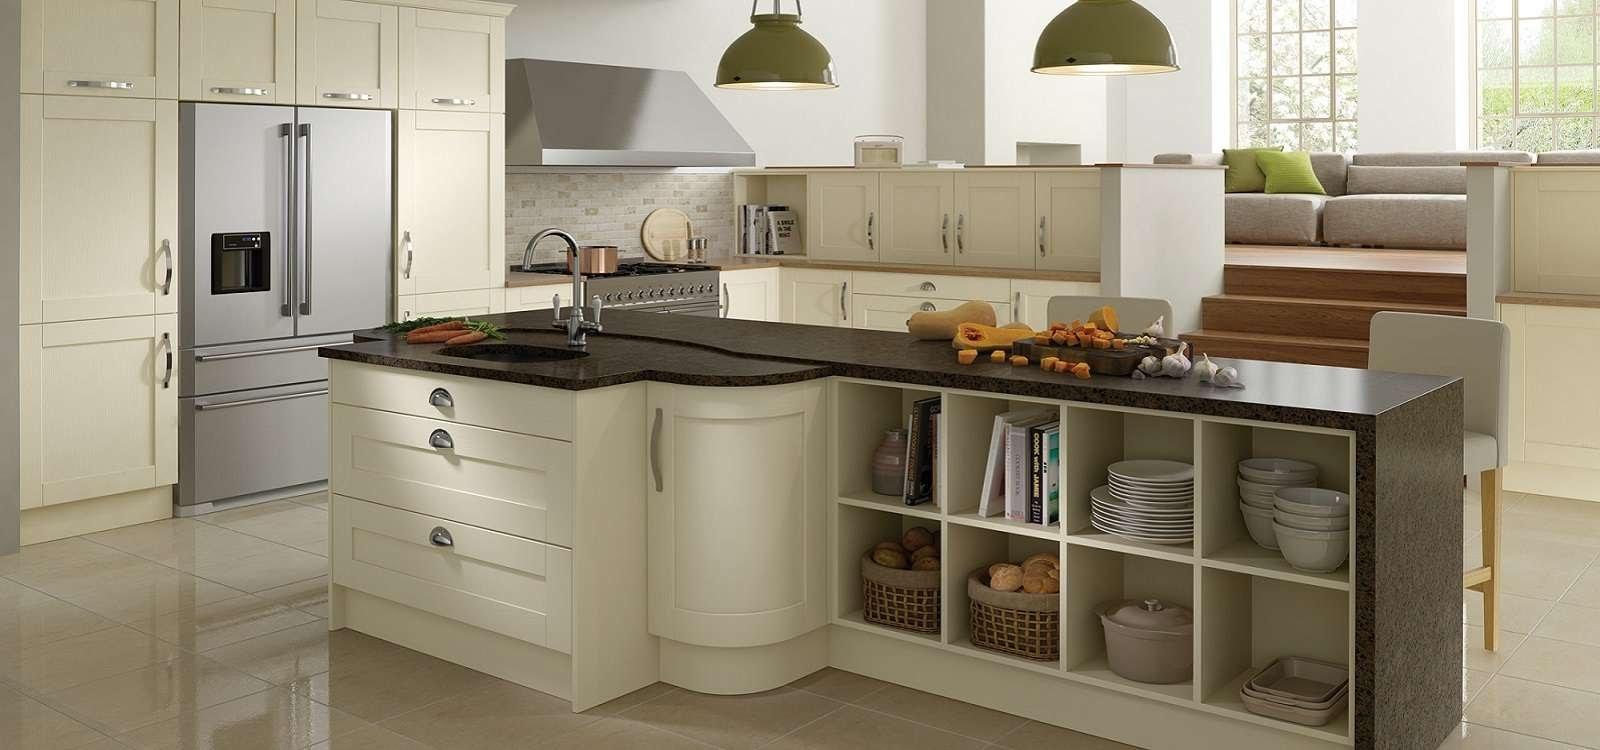 TKC-cartmel-ivory-mto-kitchen